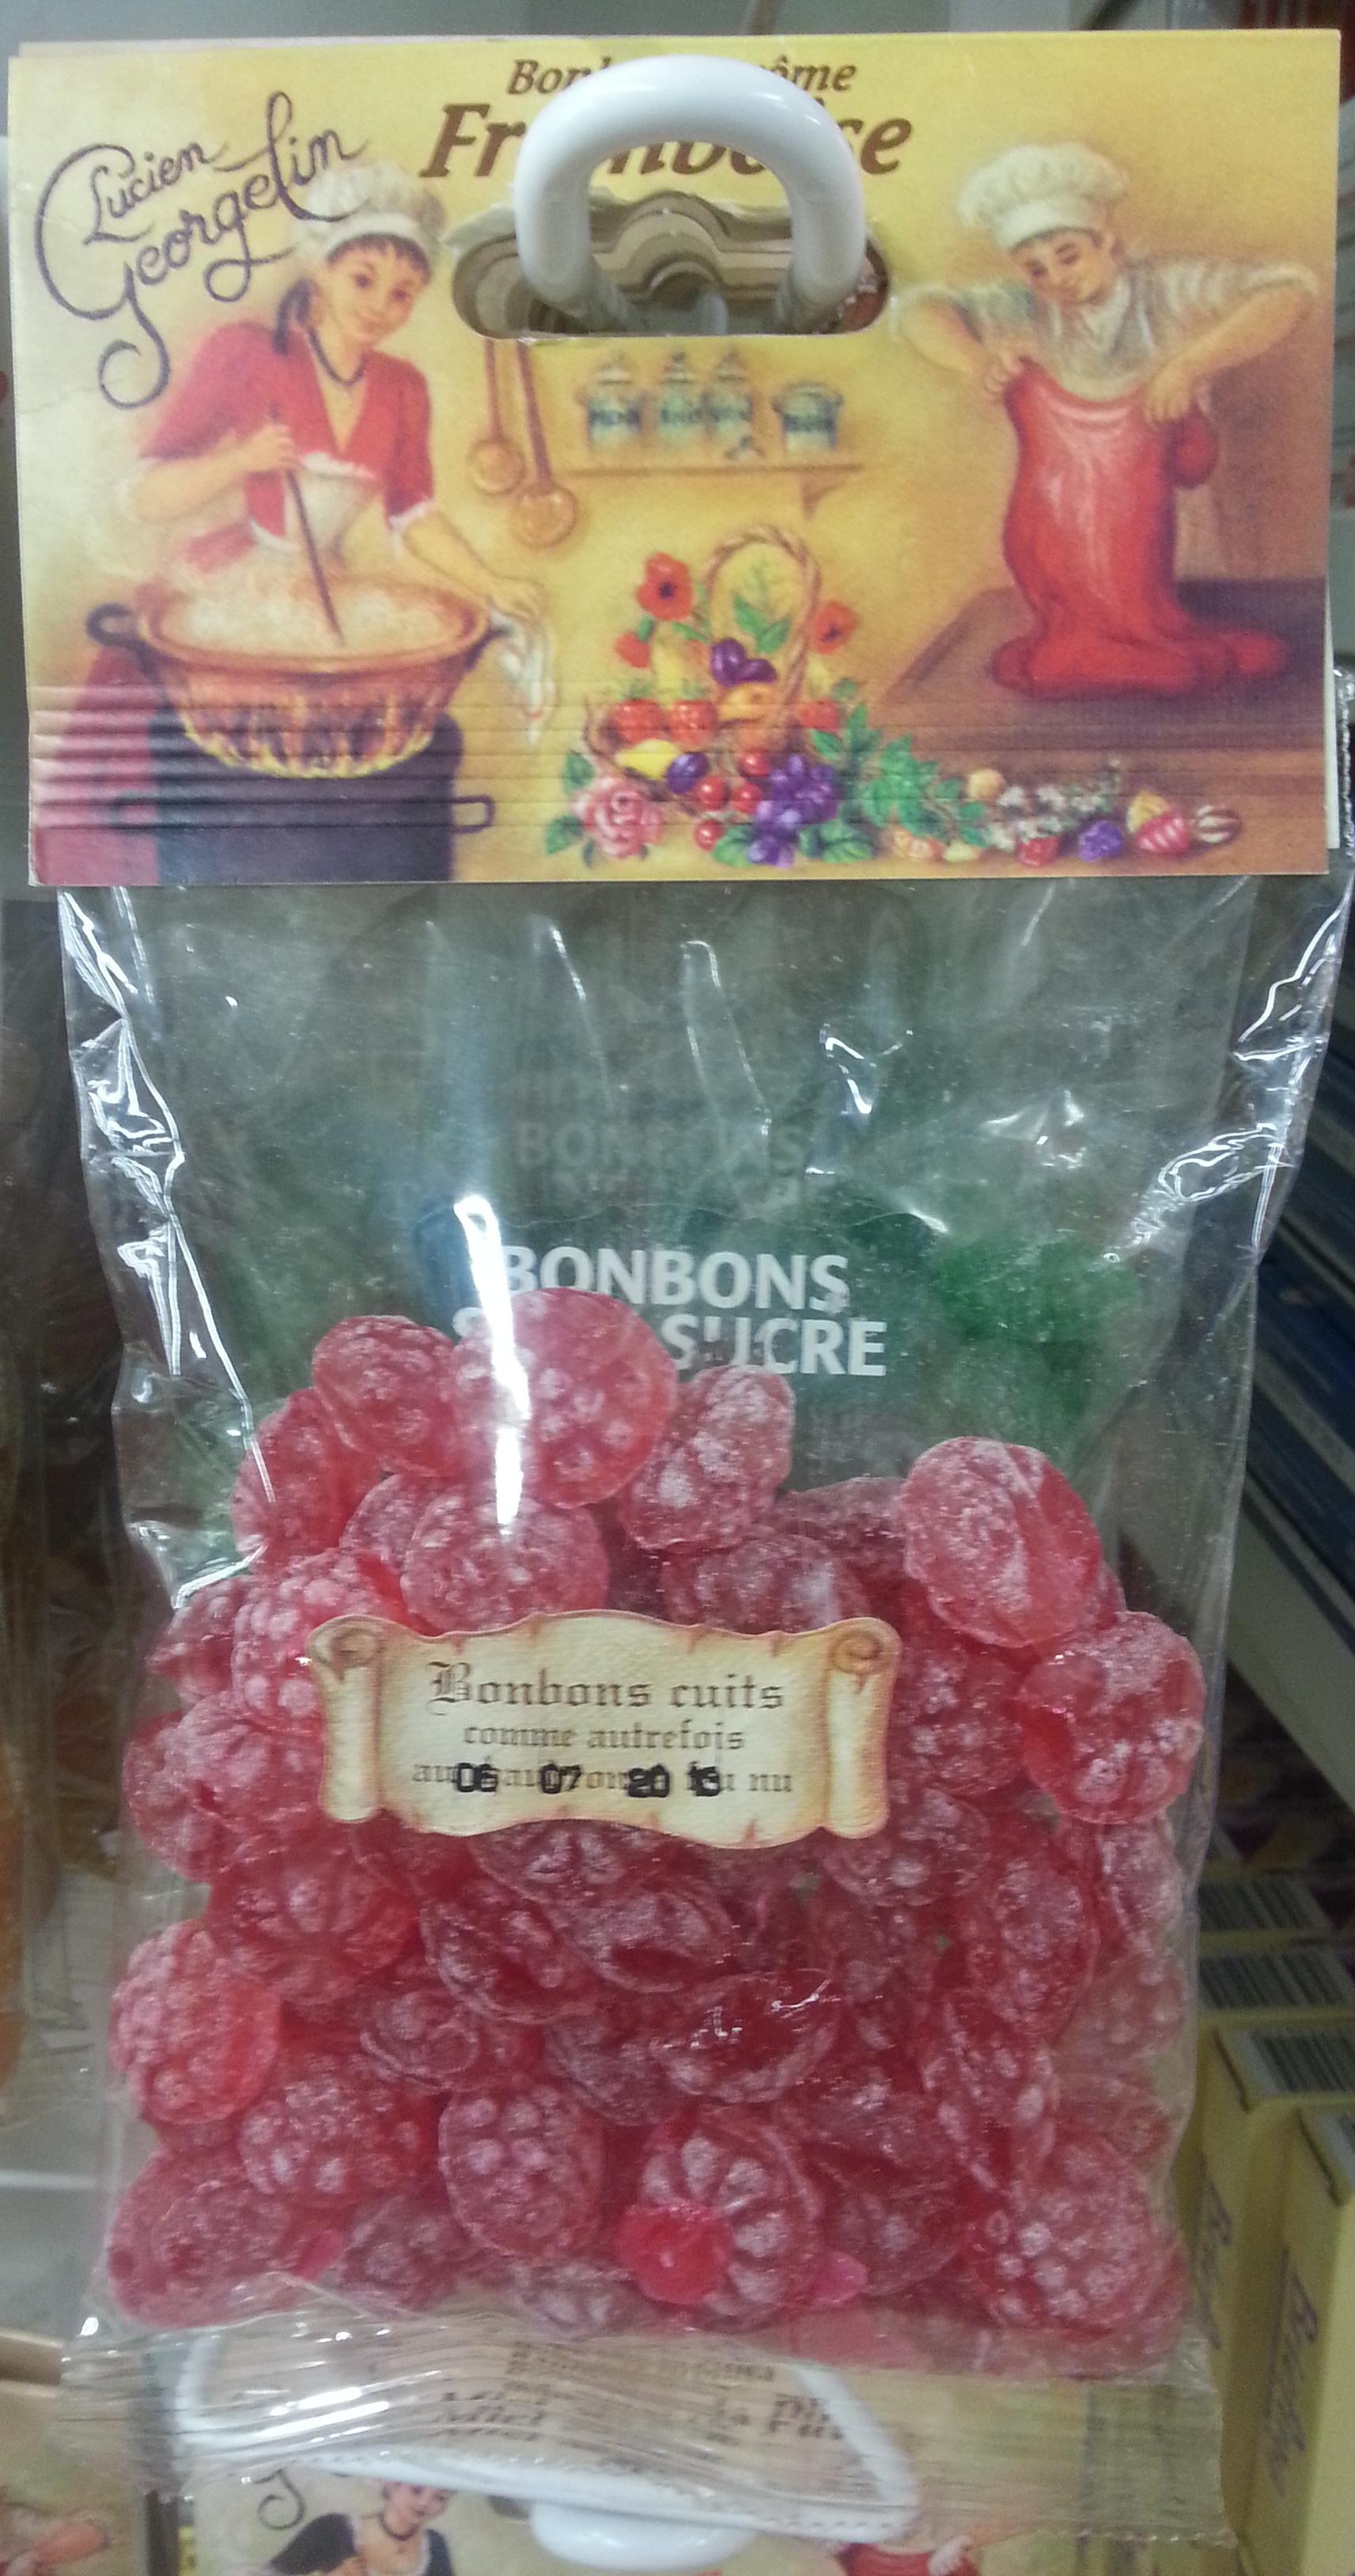 Bonbons arôme framboise - Produit